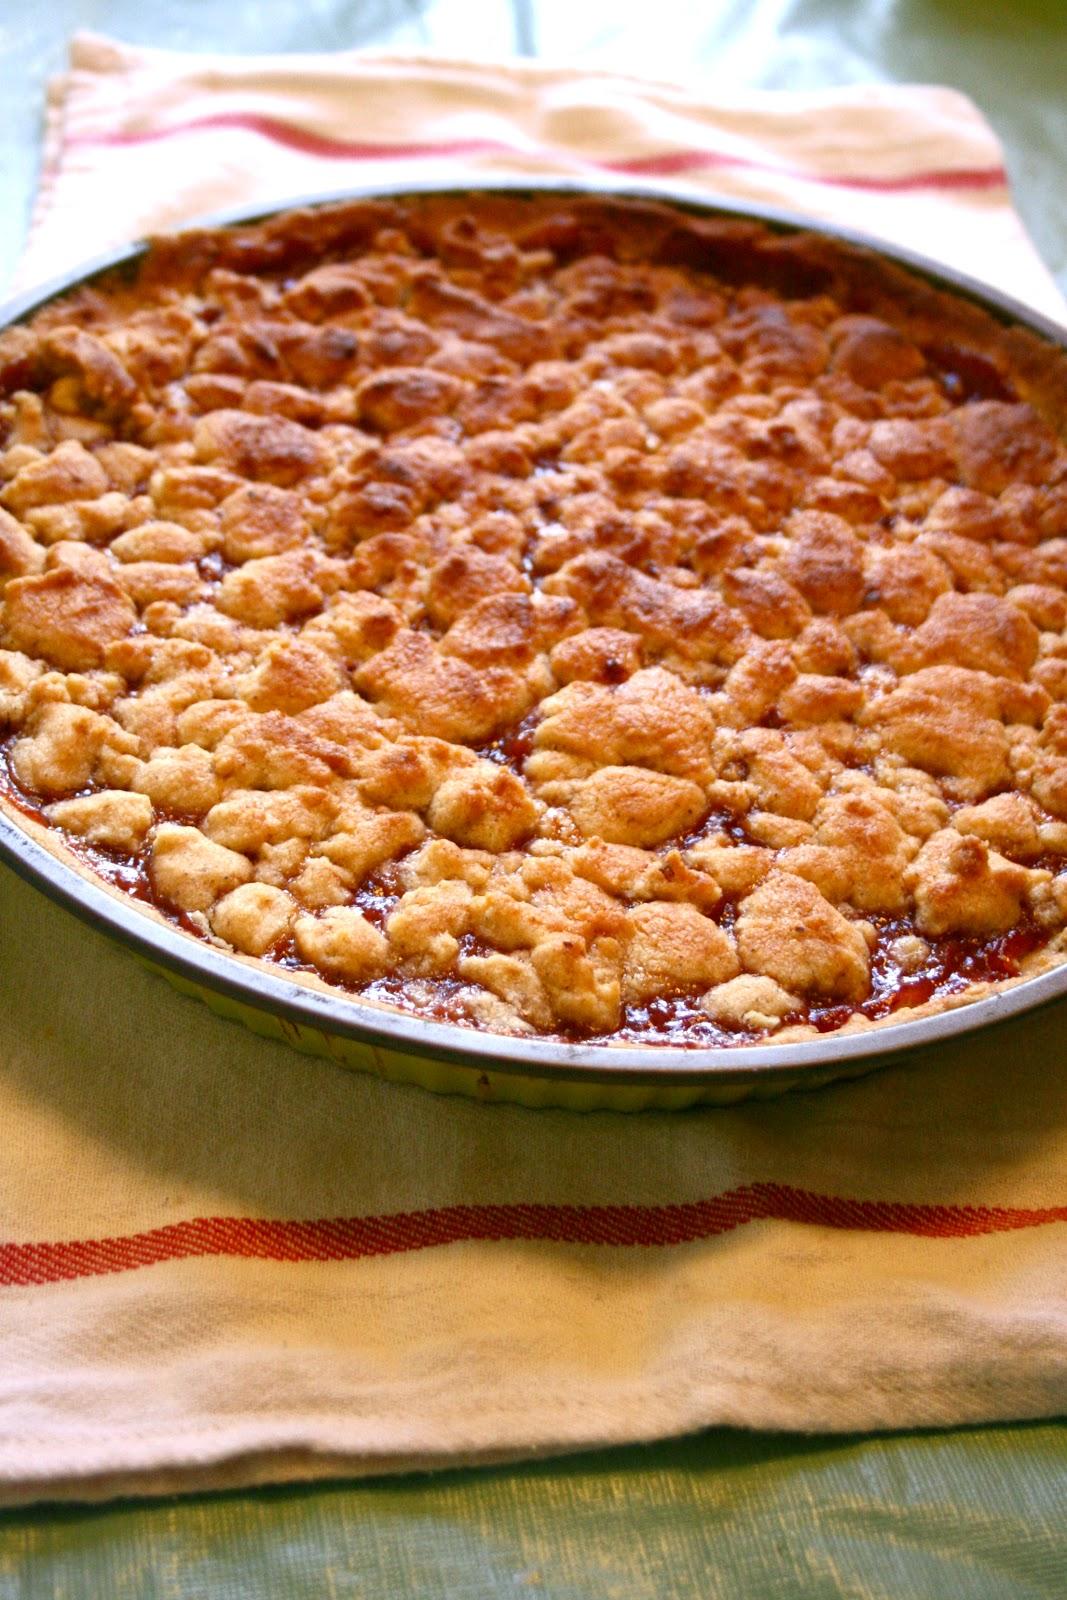 Cranberry Rhubarb Crumble